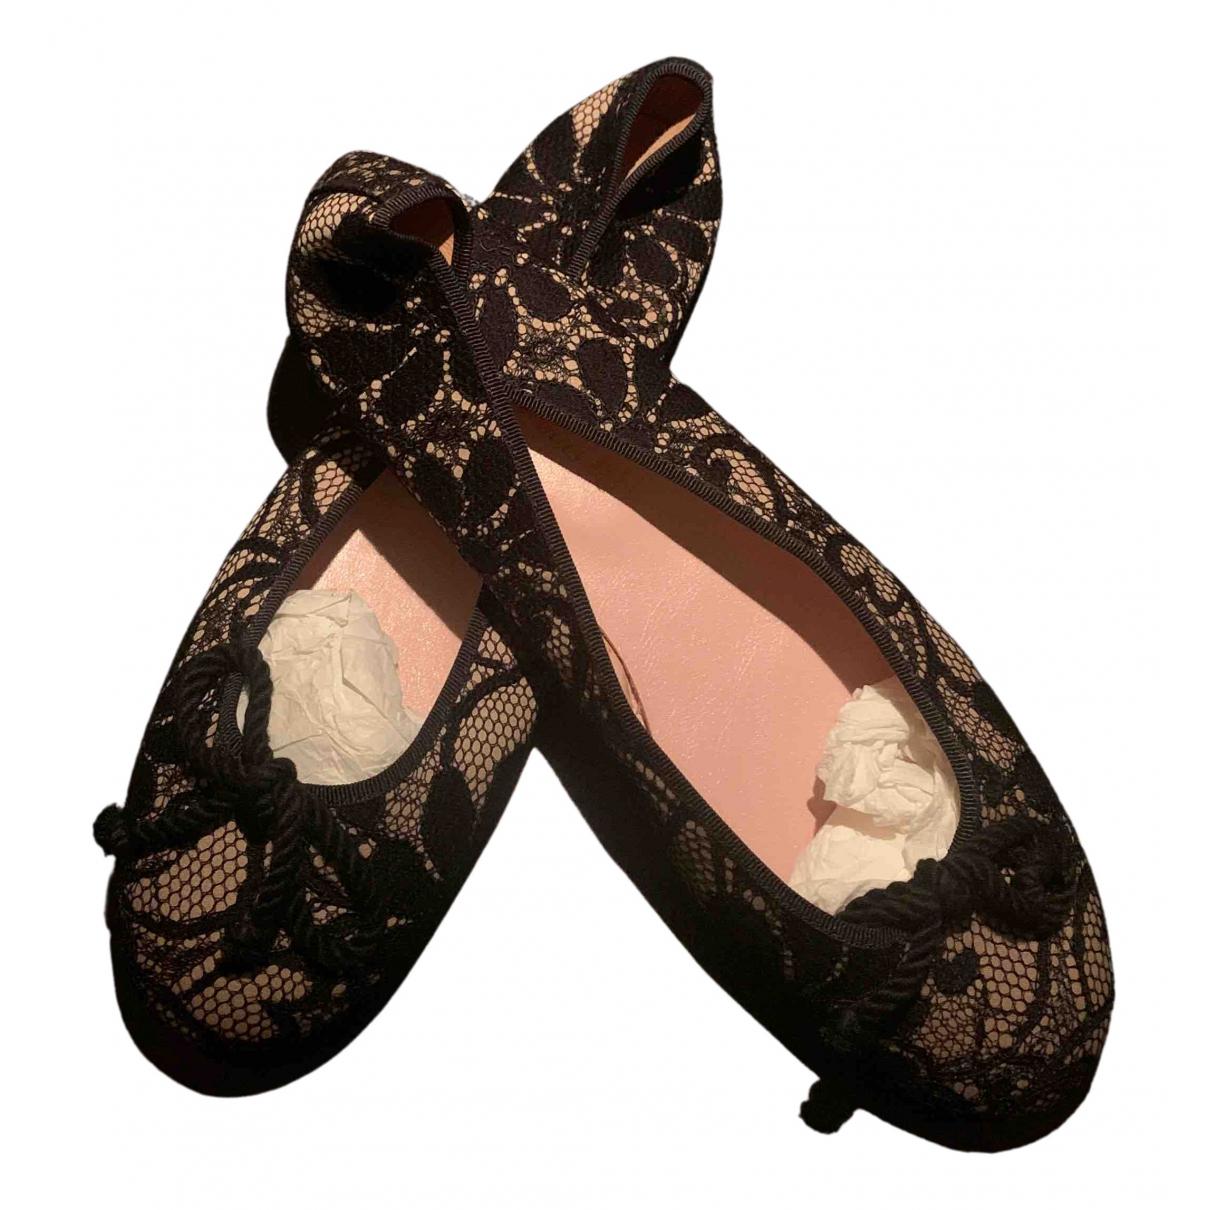 Pretty Ballerinas N Black Leather Ballet flats for Women 40 EU